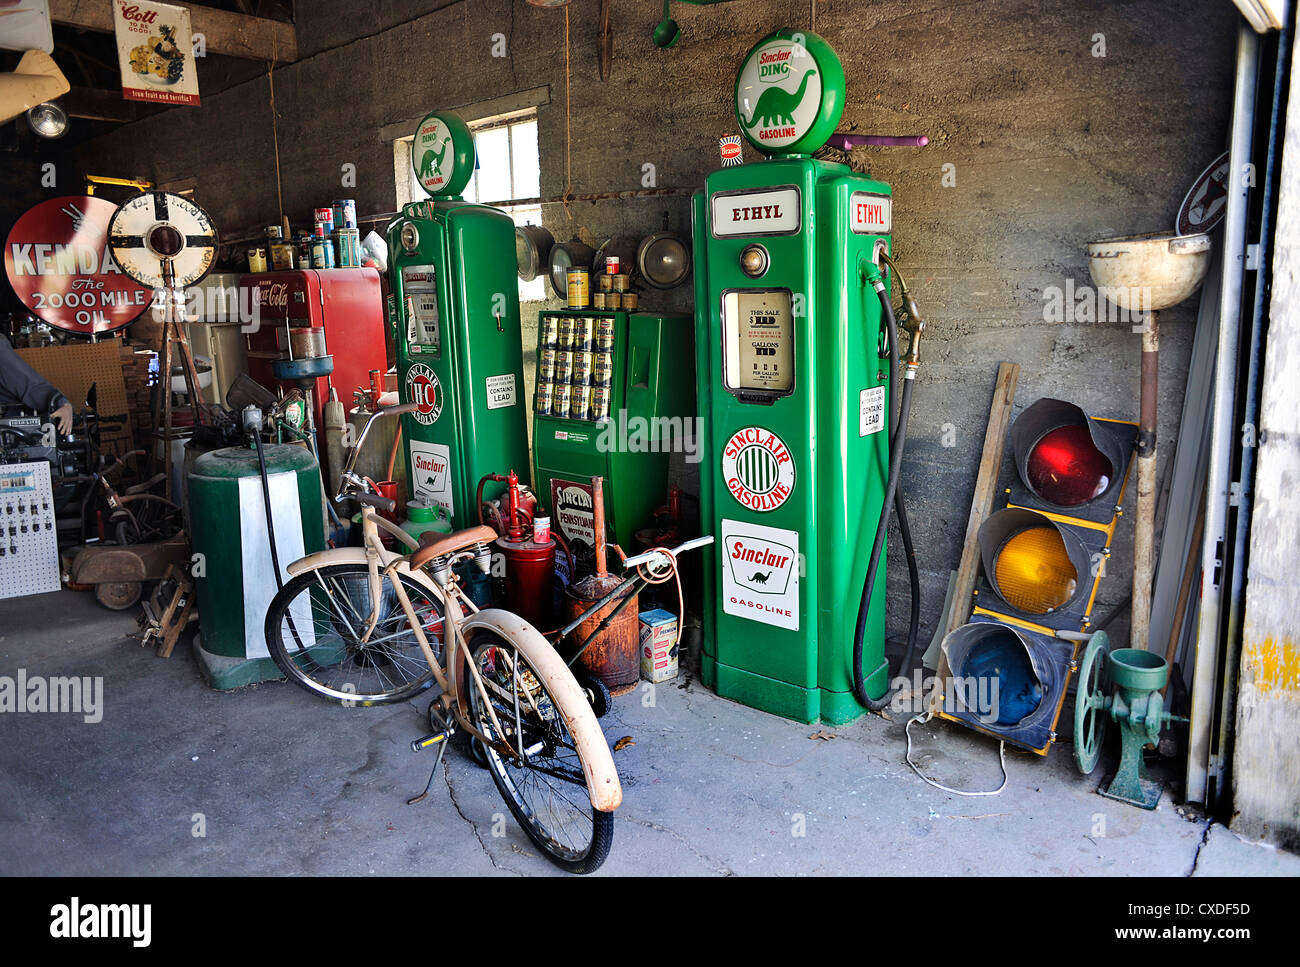 garage with vintage petrol pumps gay parita sinclair. Black Bedroom Furniture Sets. Home Design Ideas